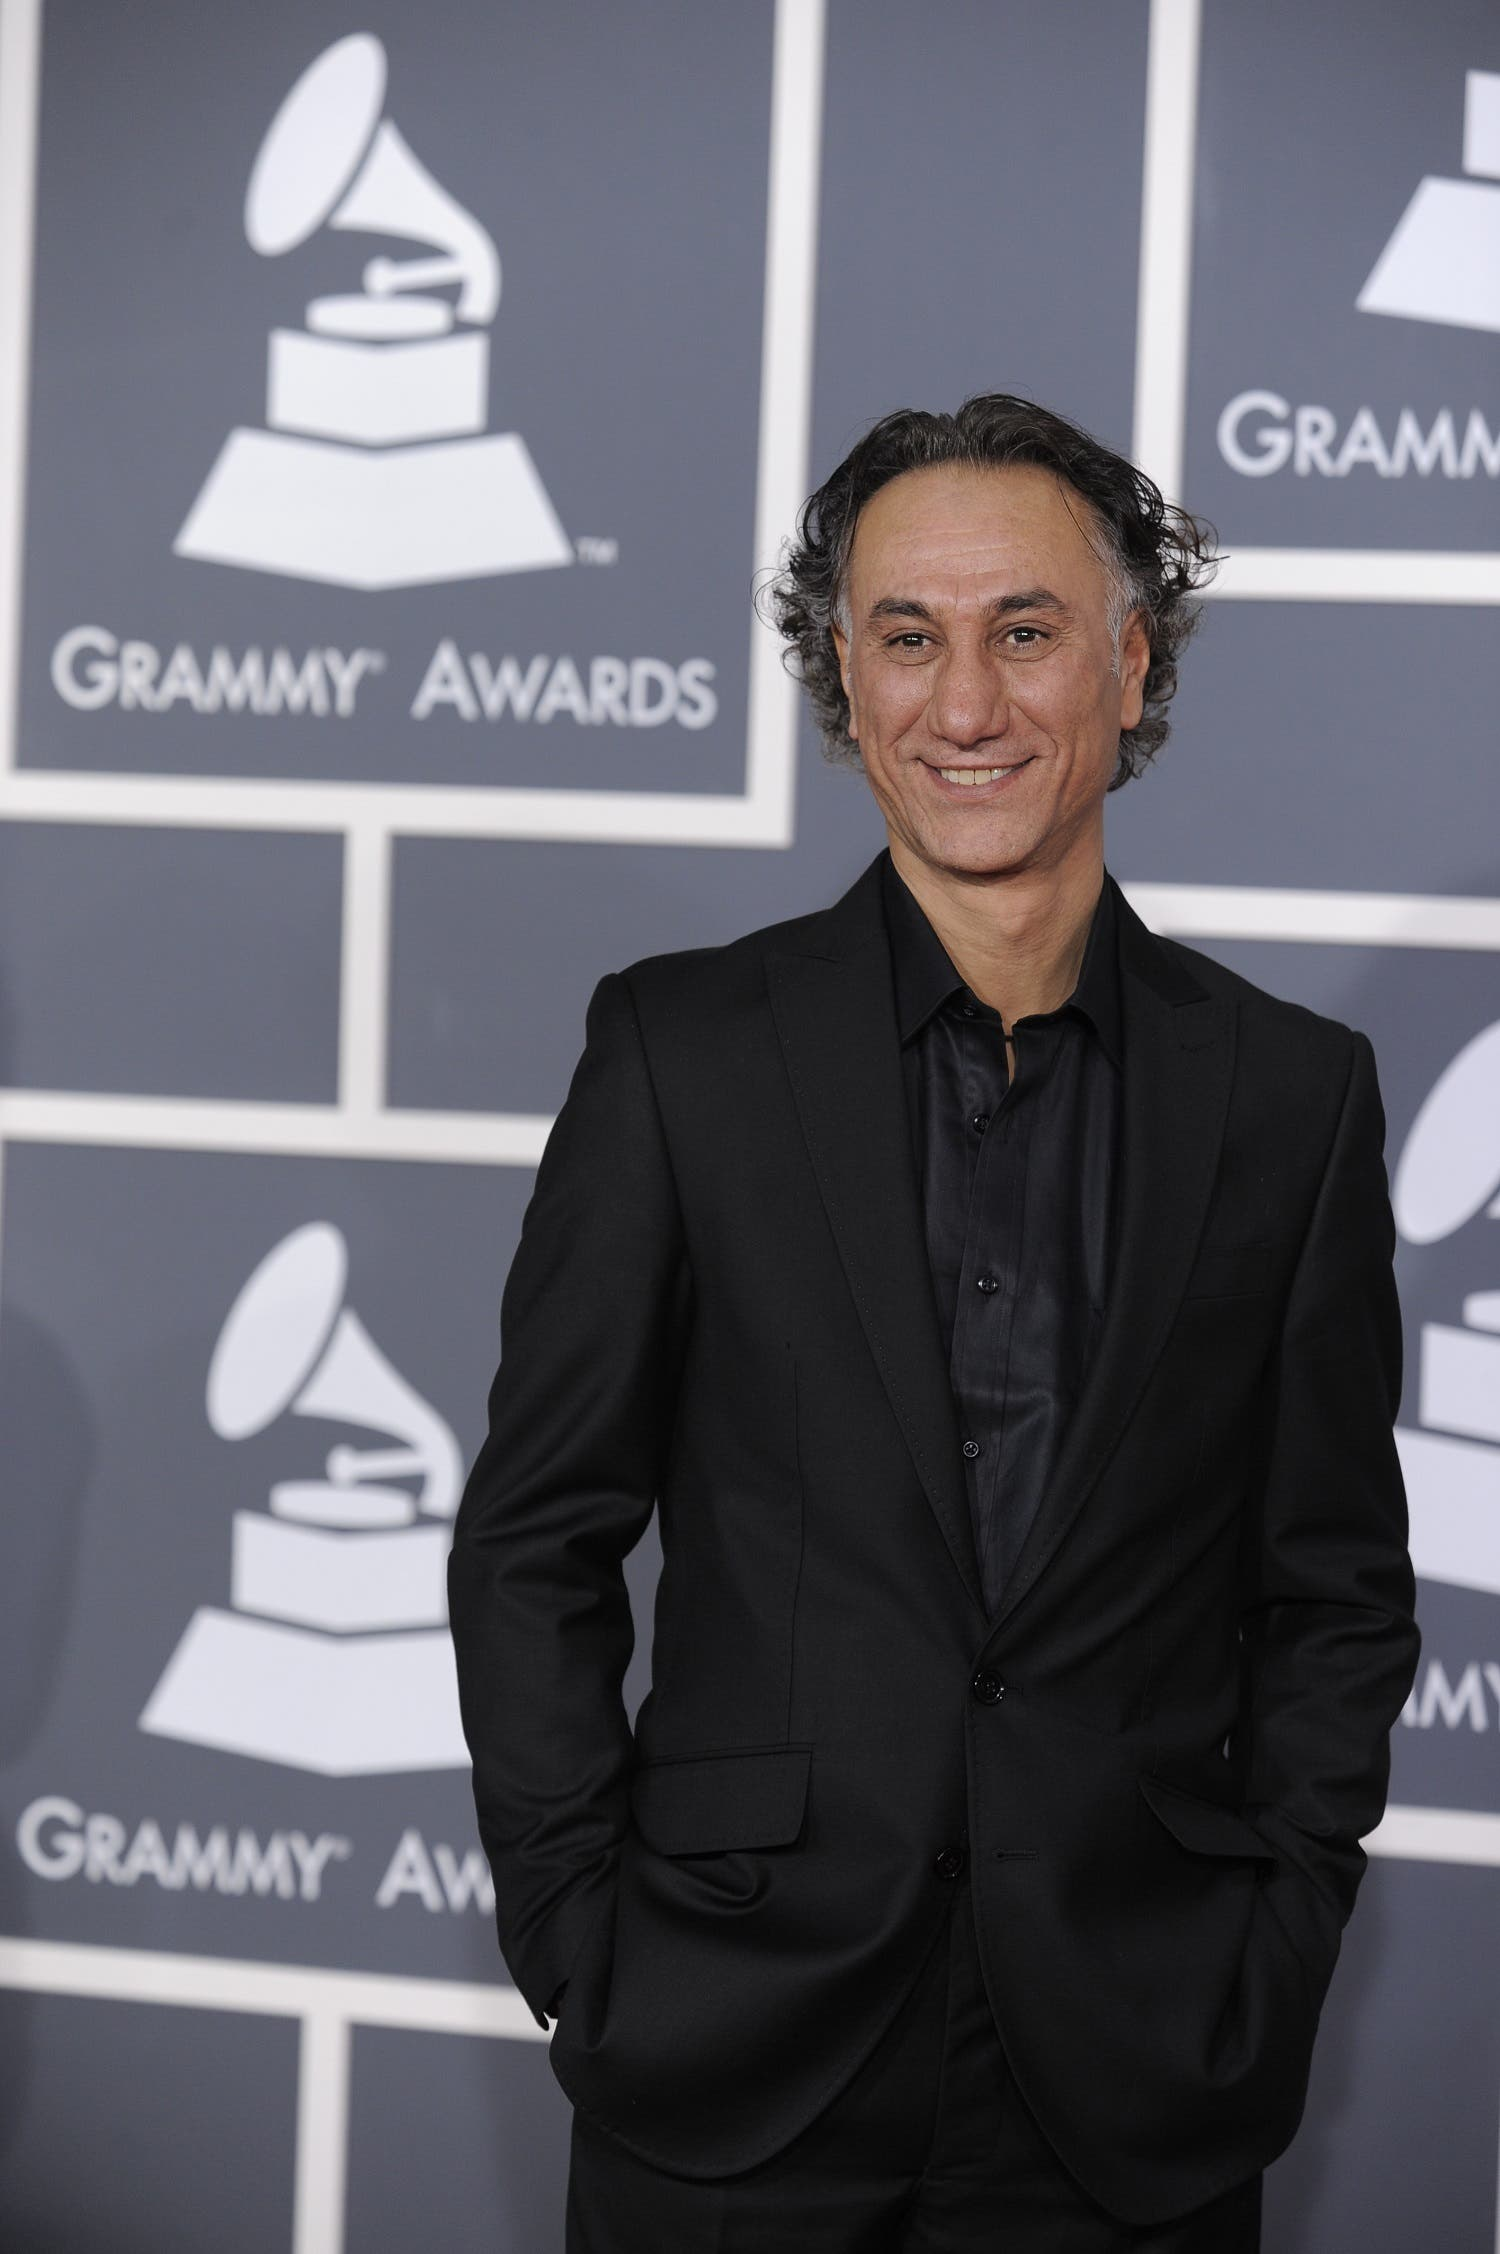 Rahim Alhaj arrives at the Grammy Awards on Jan. 31, 2010, in Los Angeles. (AP)